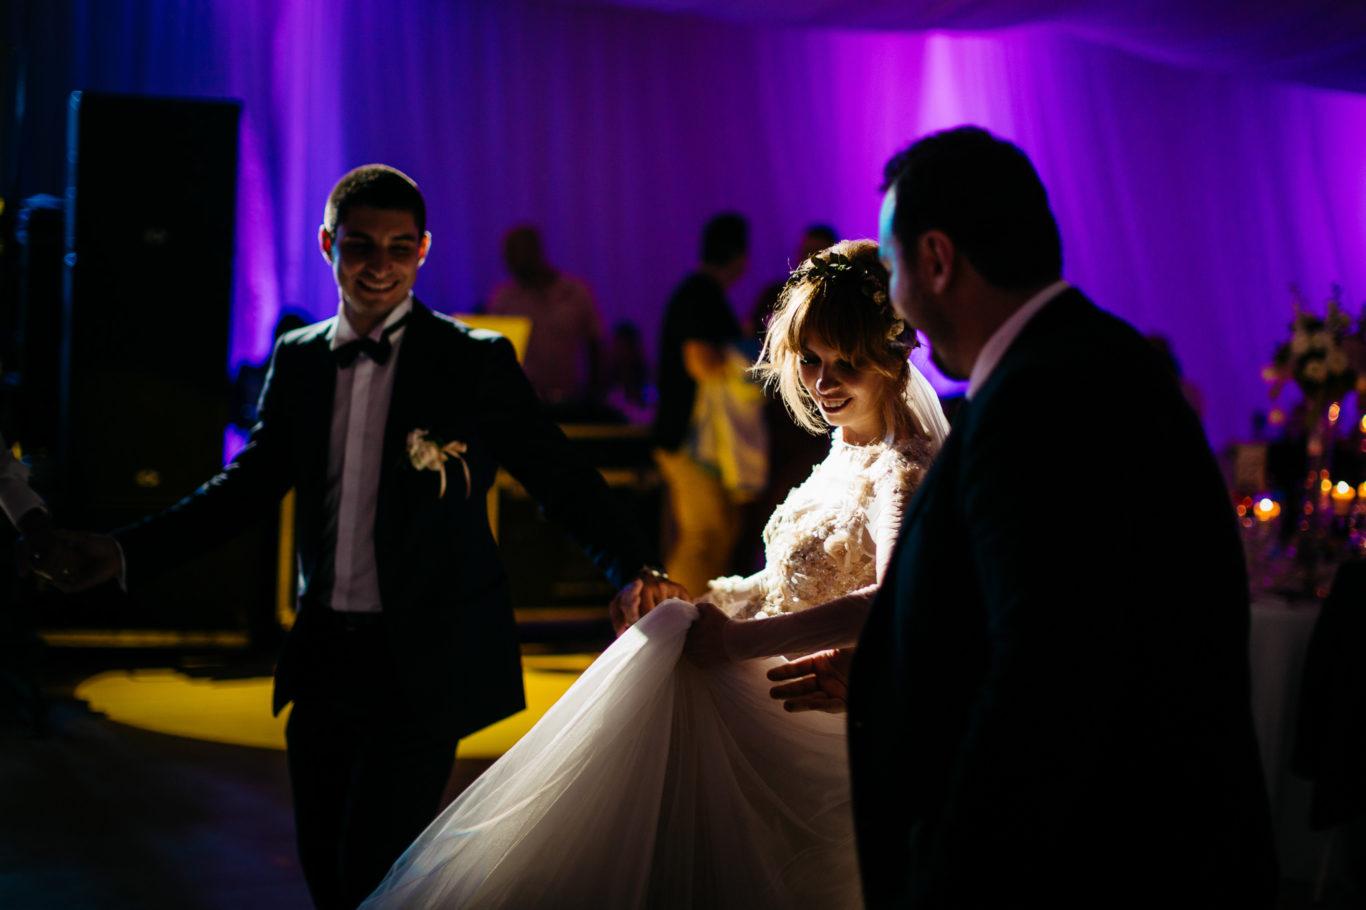 0562-Fotografie-nunta-Stirbey-Laura-Rares-fotograf-Ciprian-Dumitrescu-DCF_4283